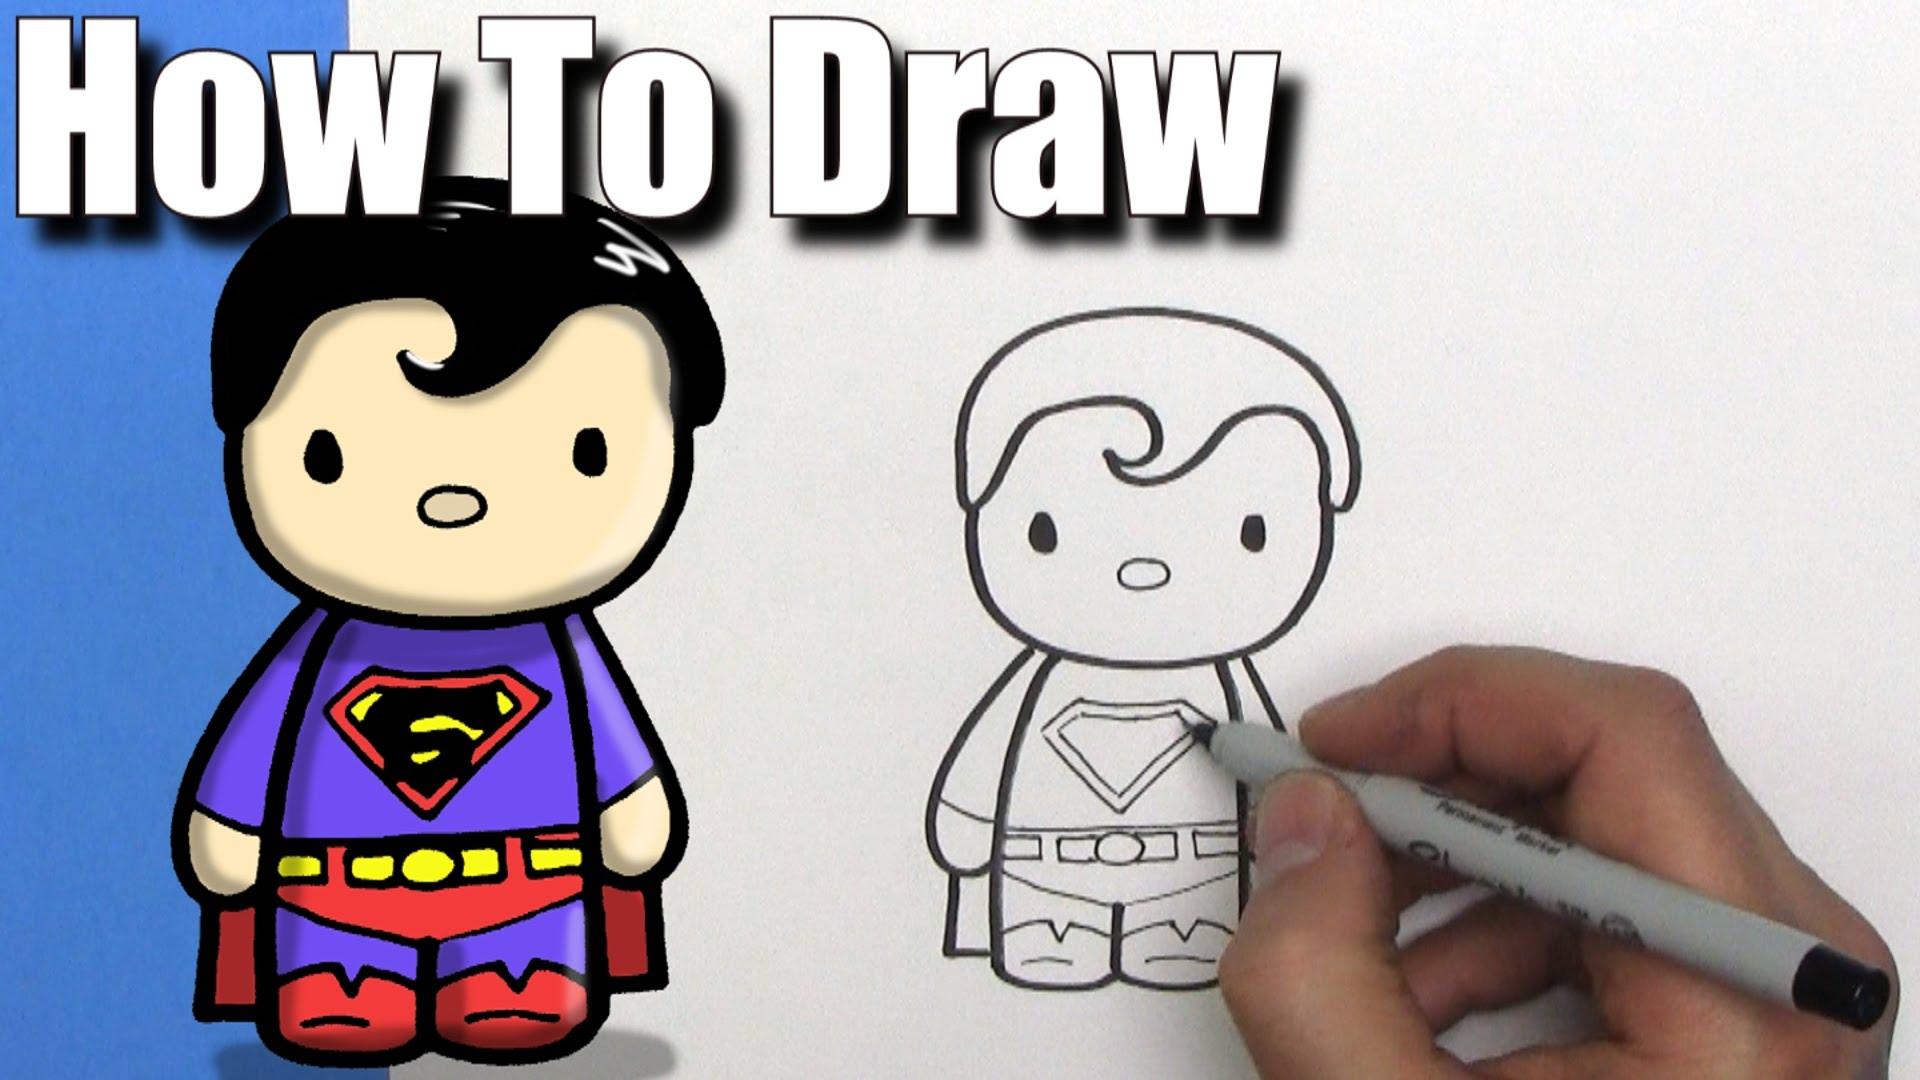 1920x1080 How To Draw A Cute Cartoon Superman